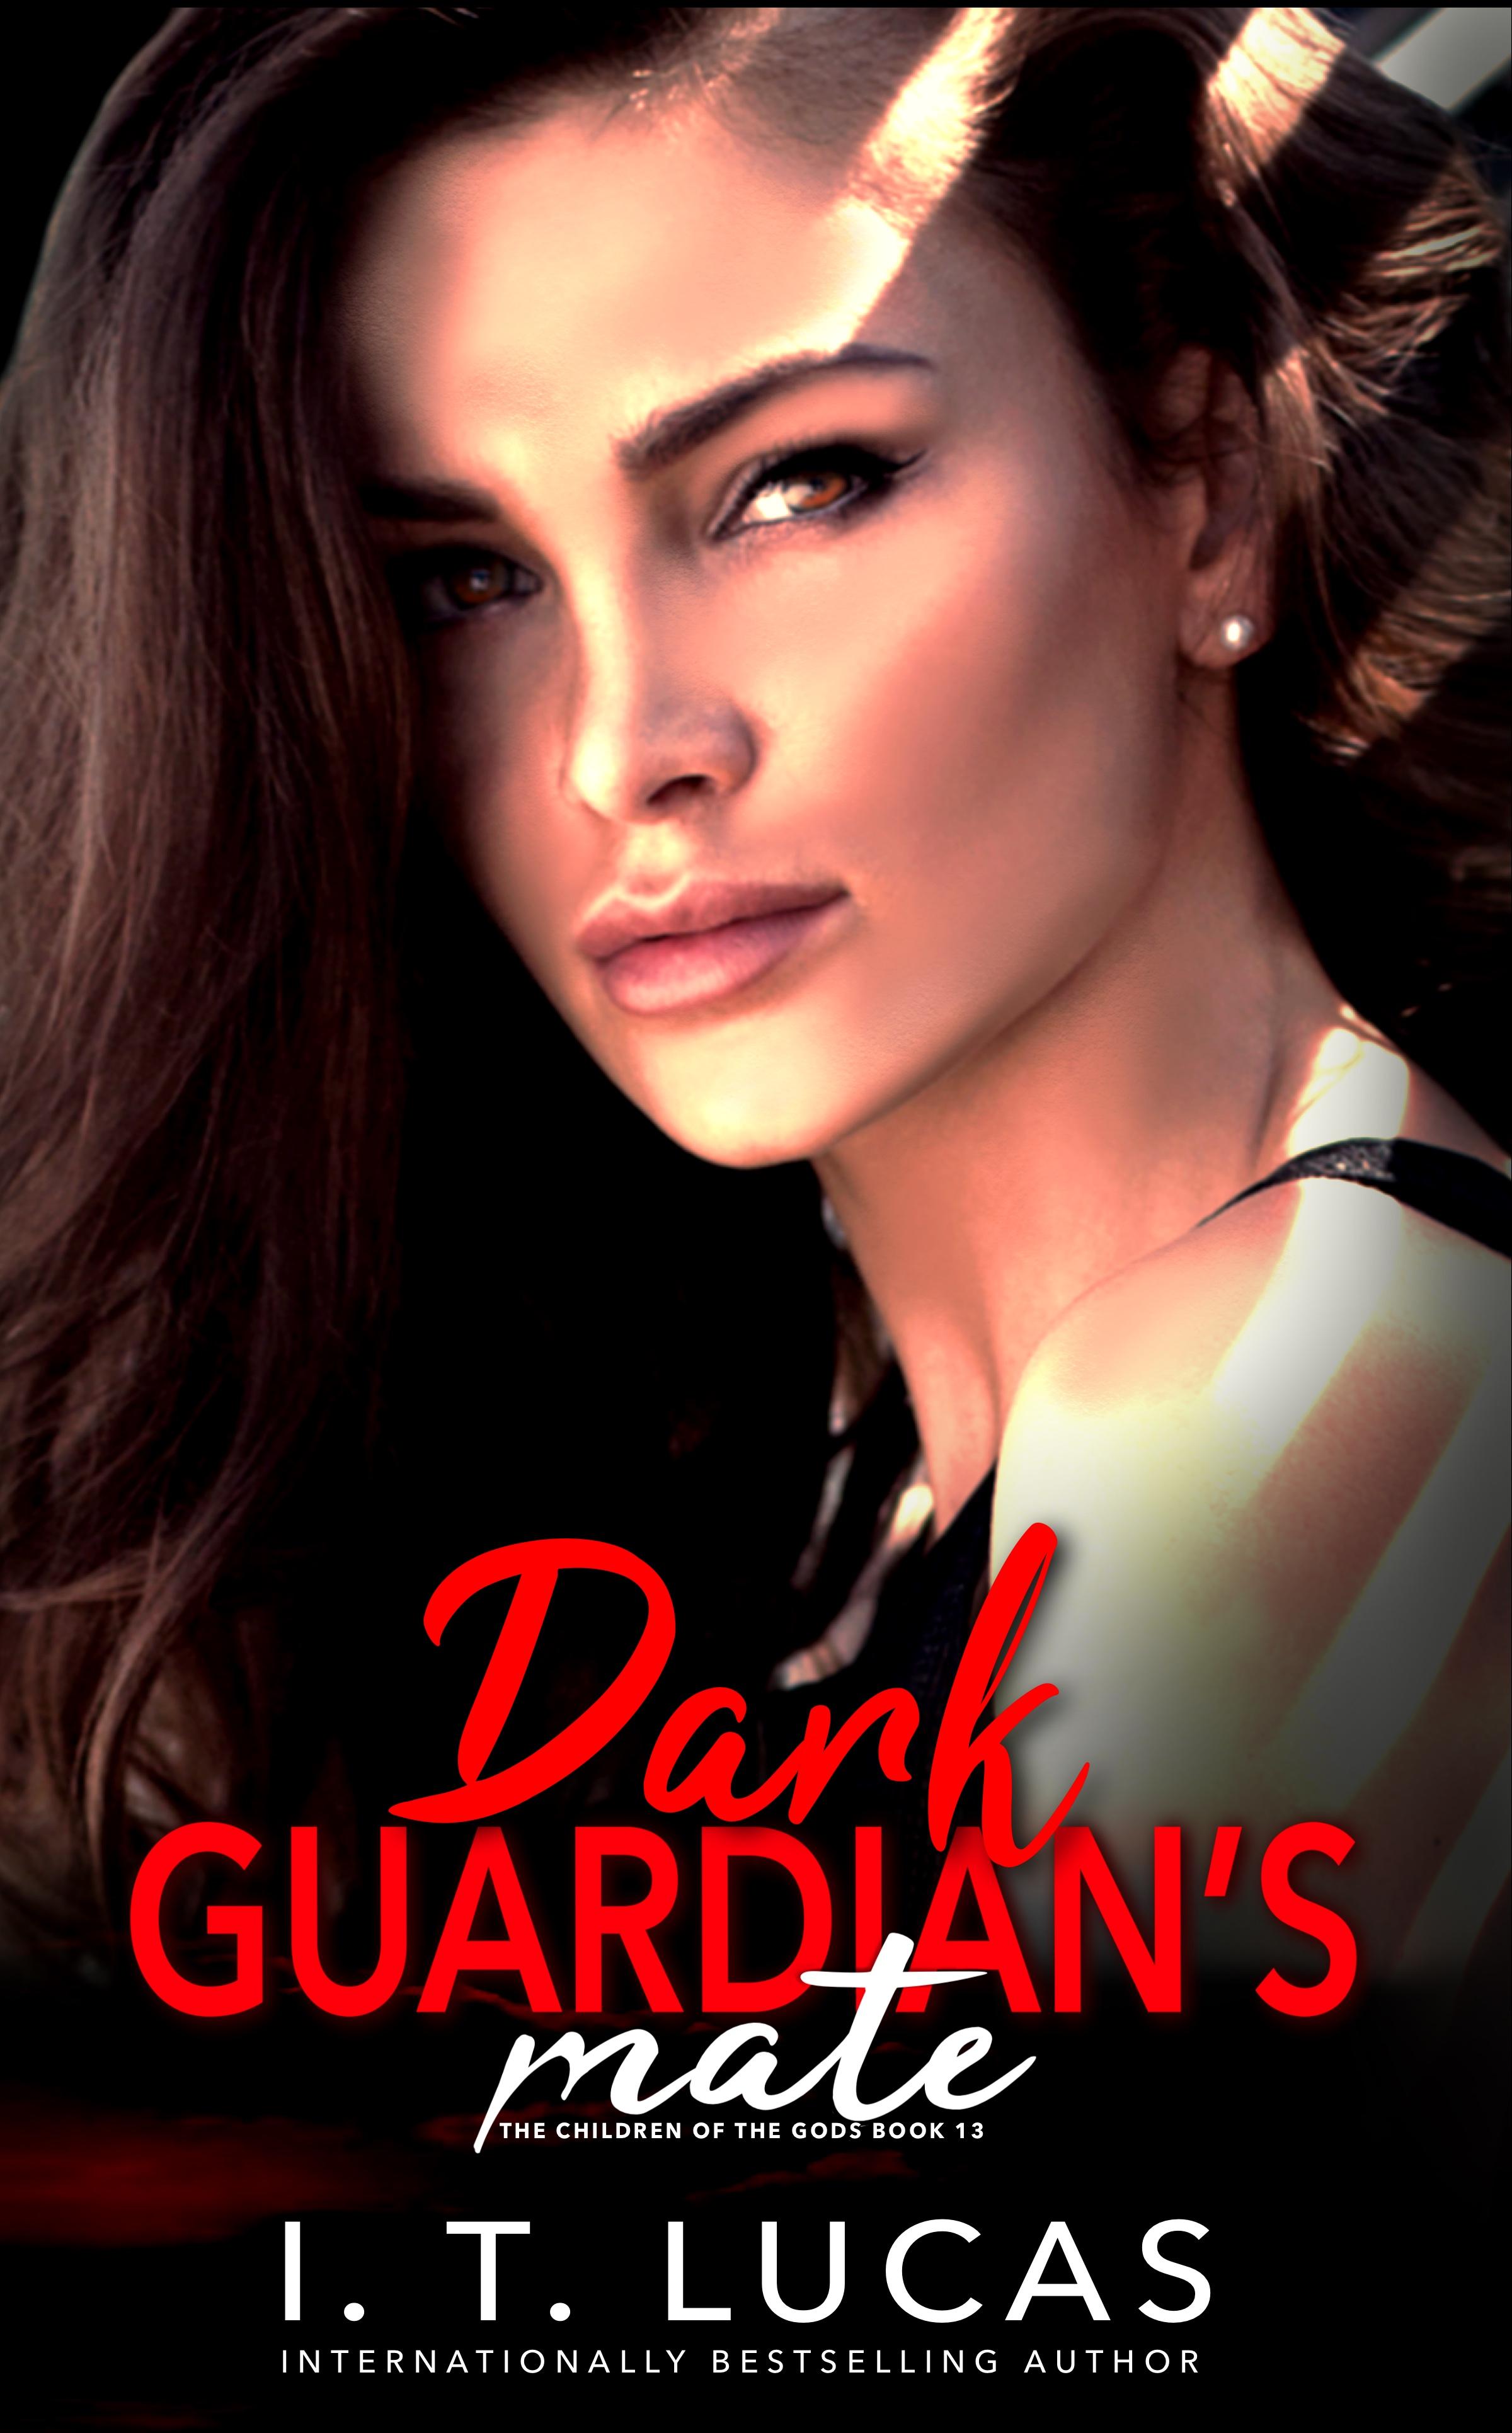 Dark Guardian's Mate (The Children of the Gods #13)